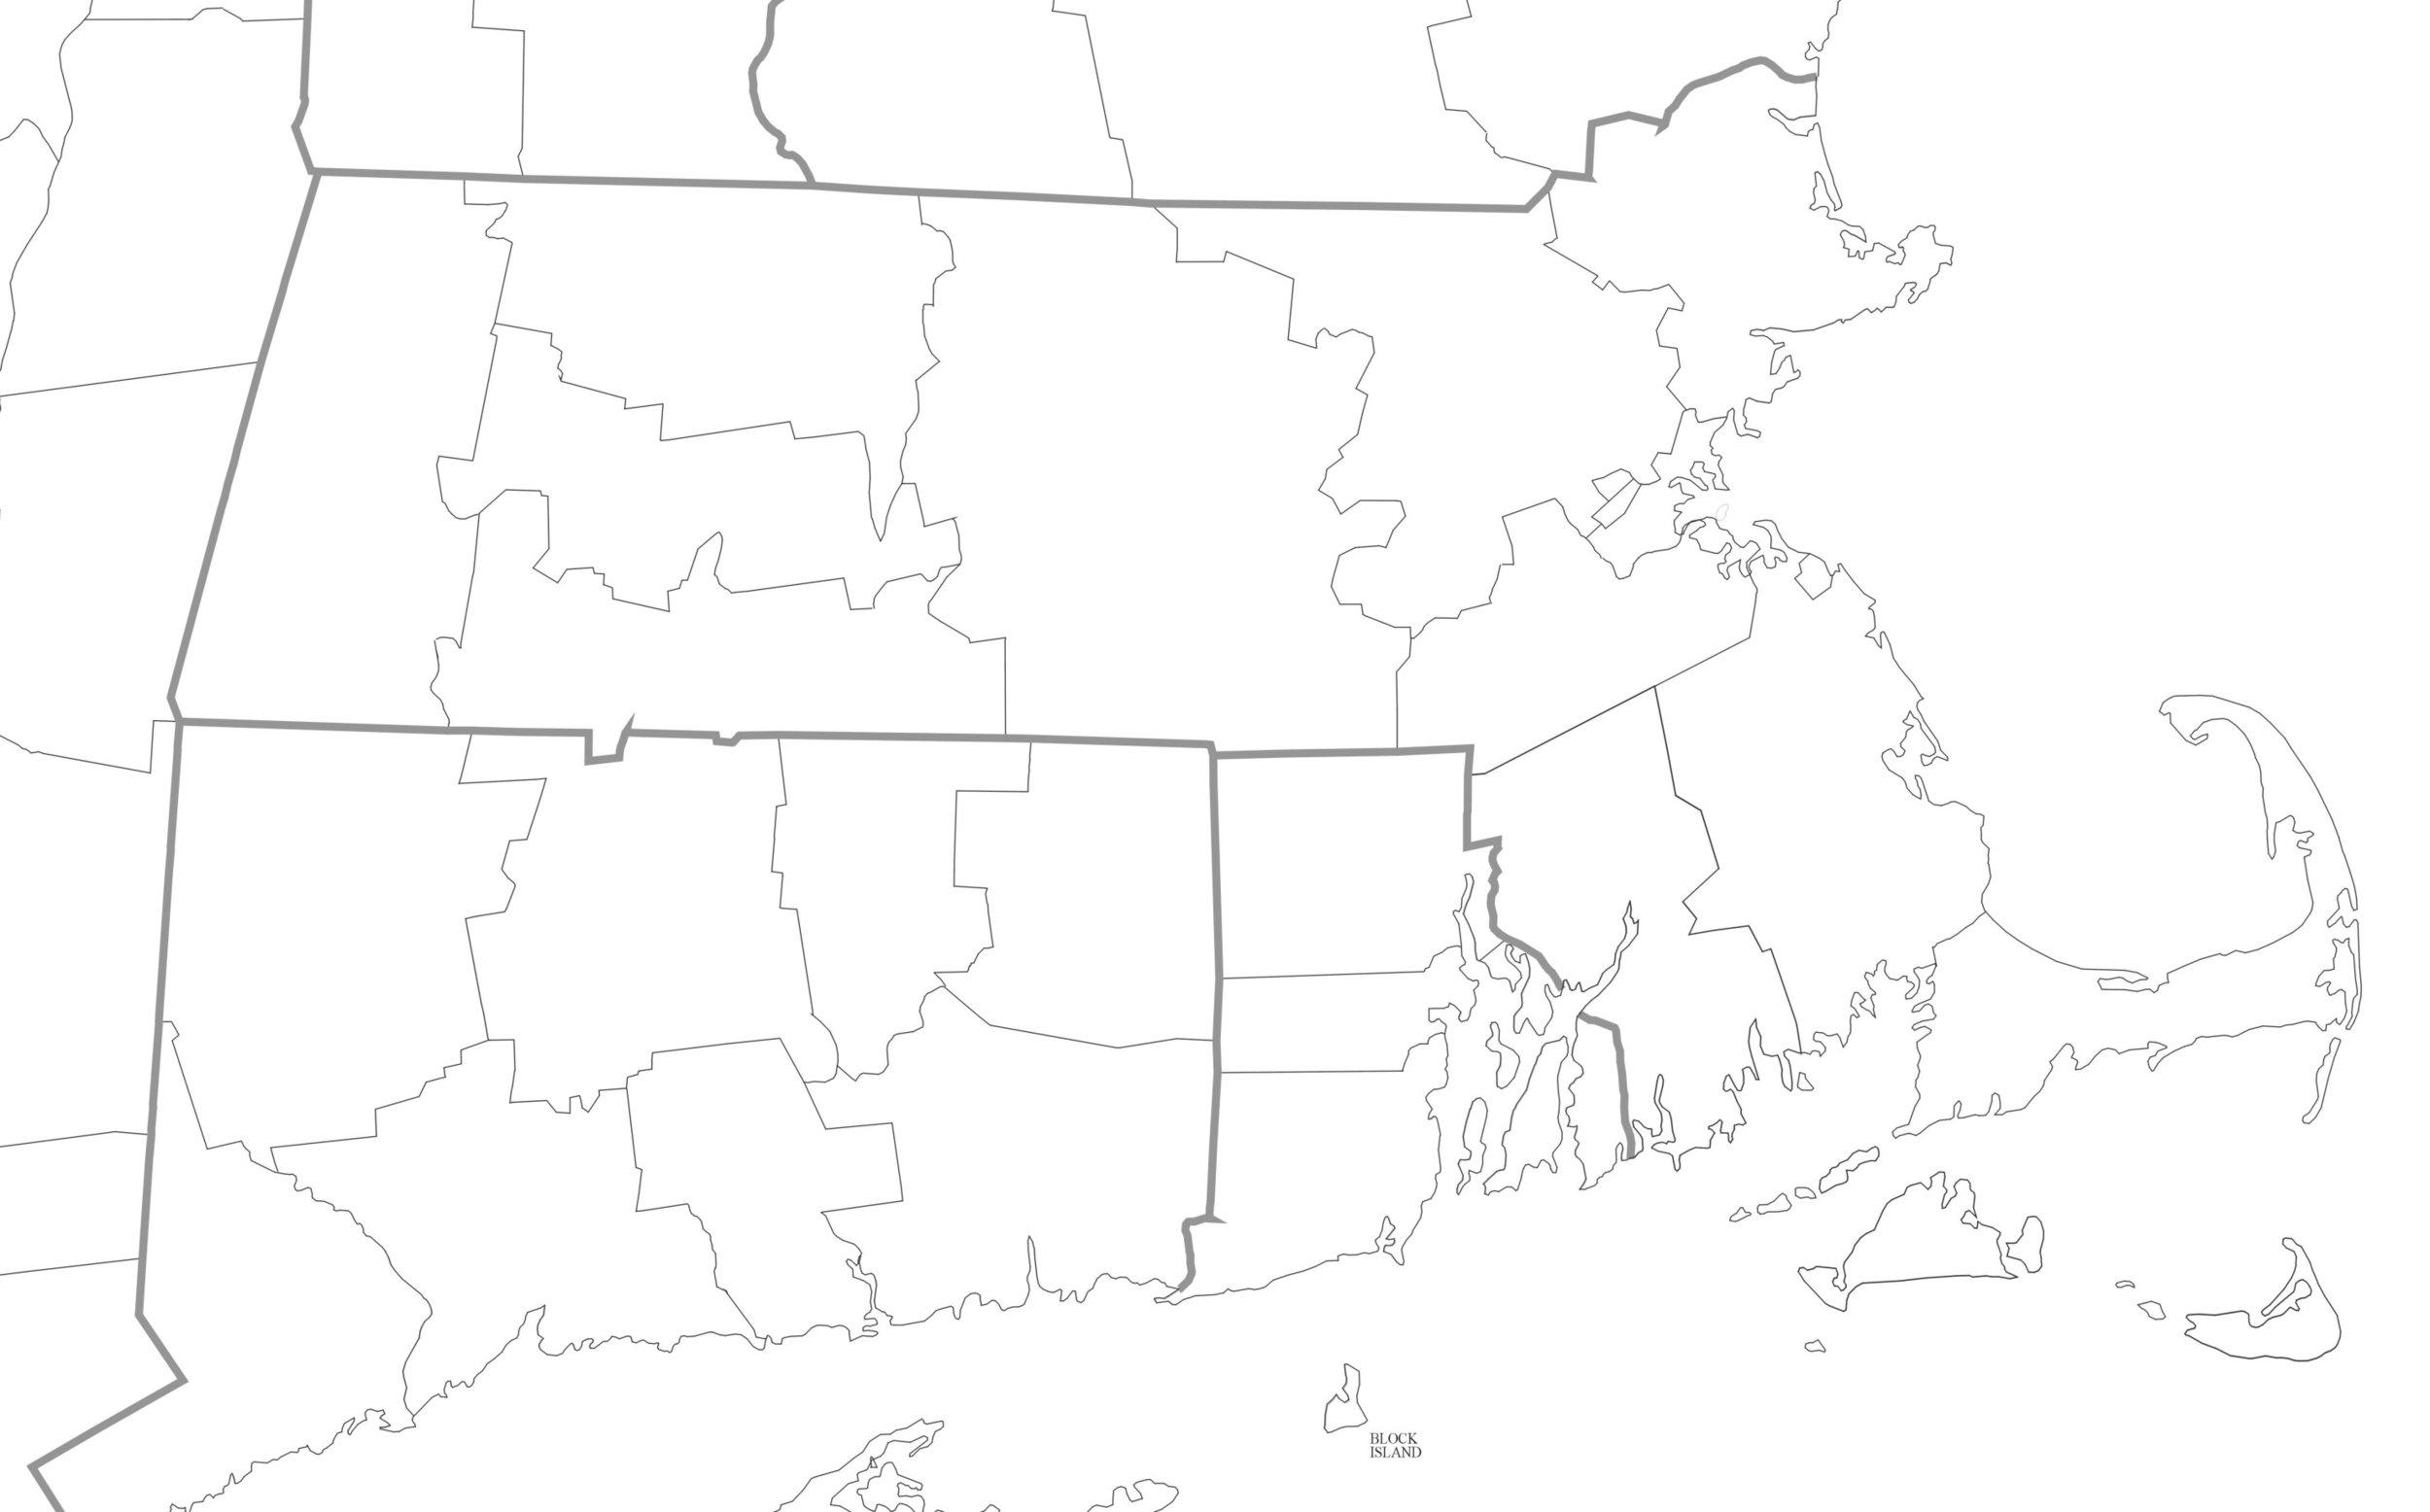 Rhode Island, Massachusetts, and Connecticut